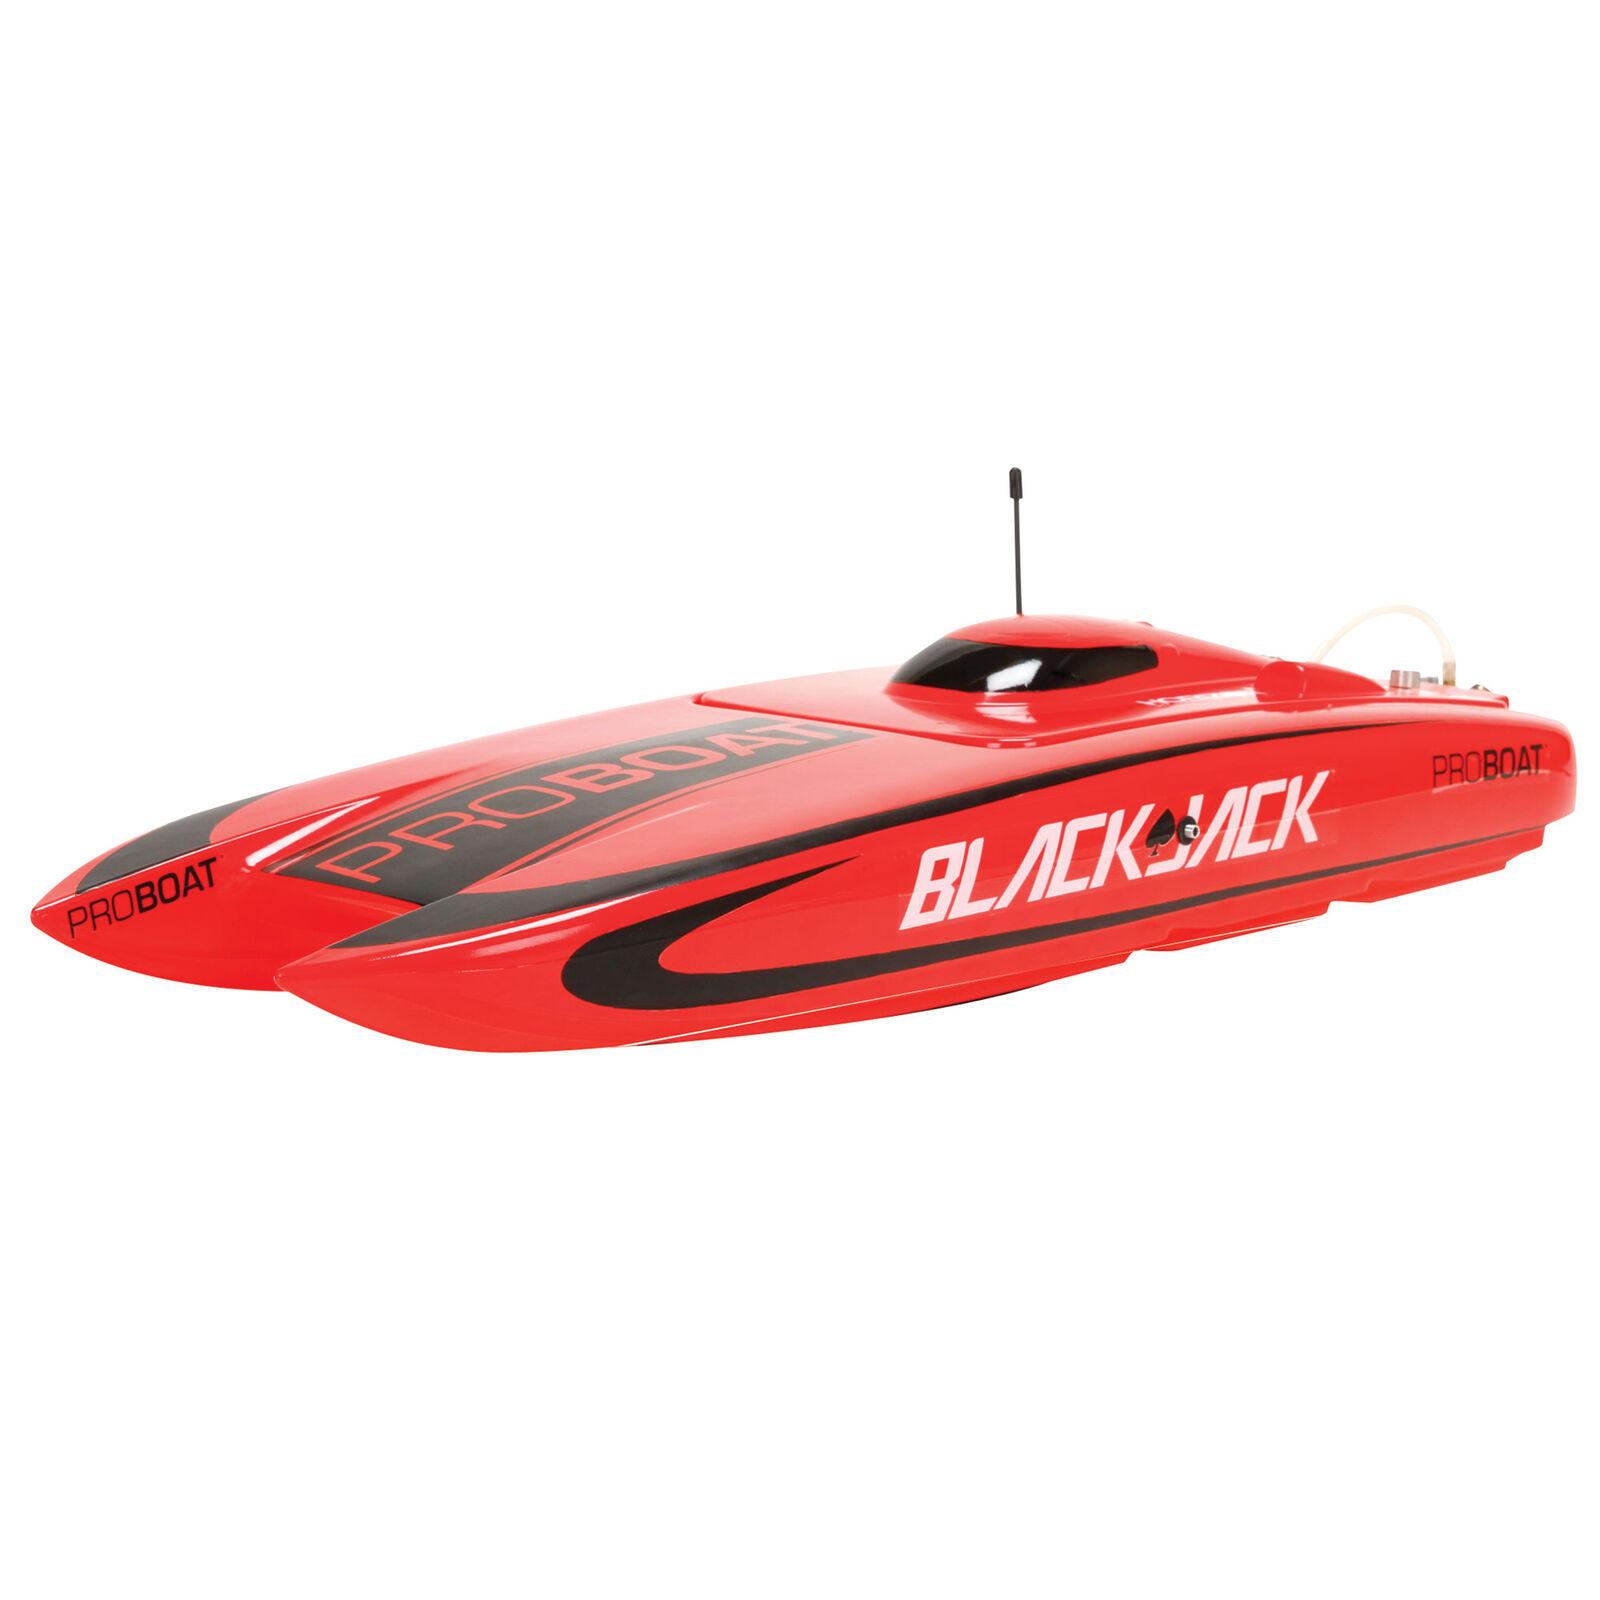 "Blackjack 24"" Brushless Catamaran RTR"